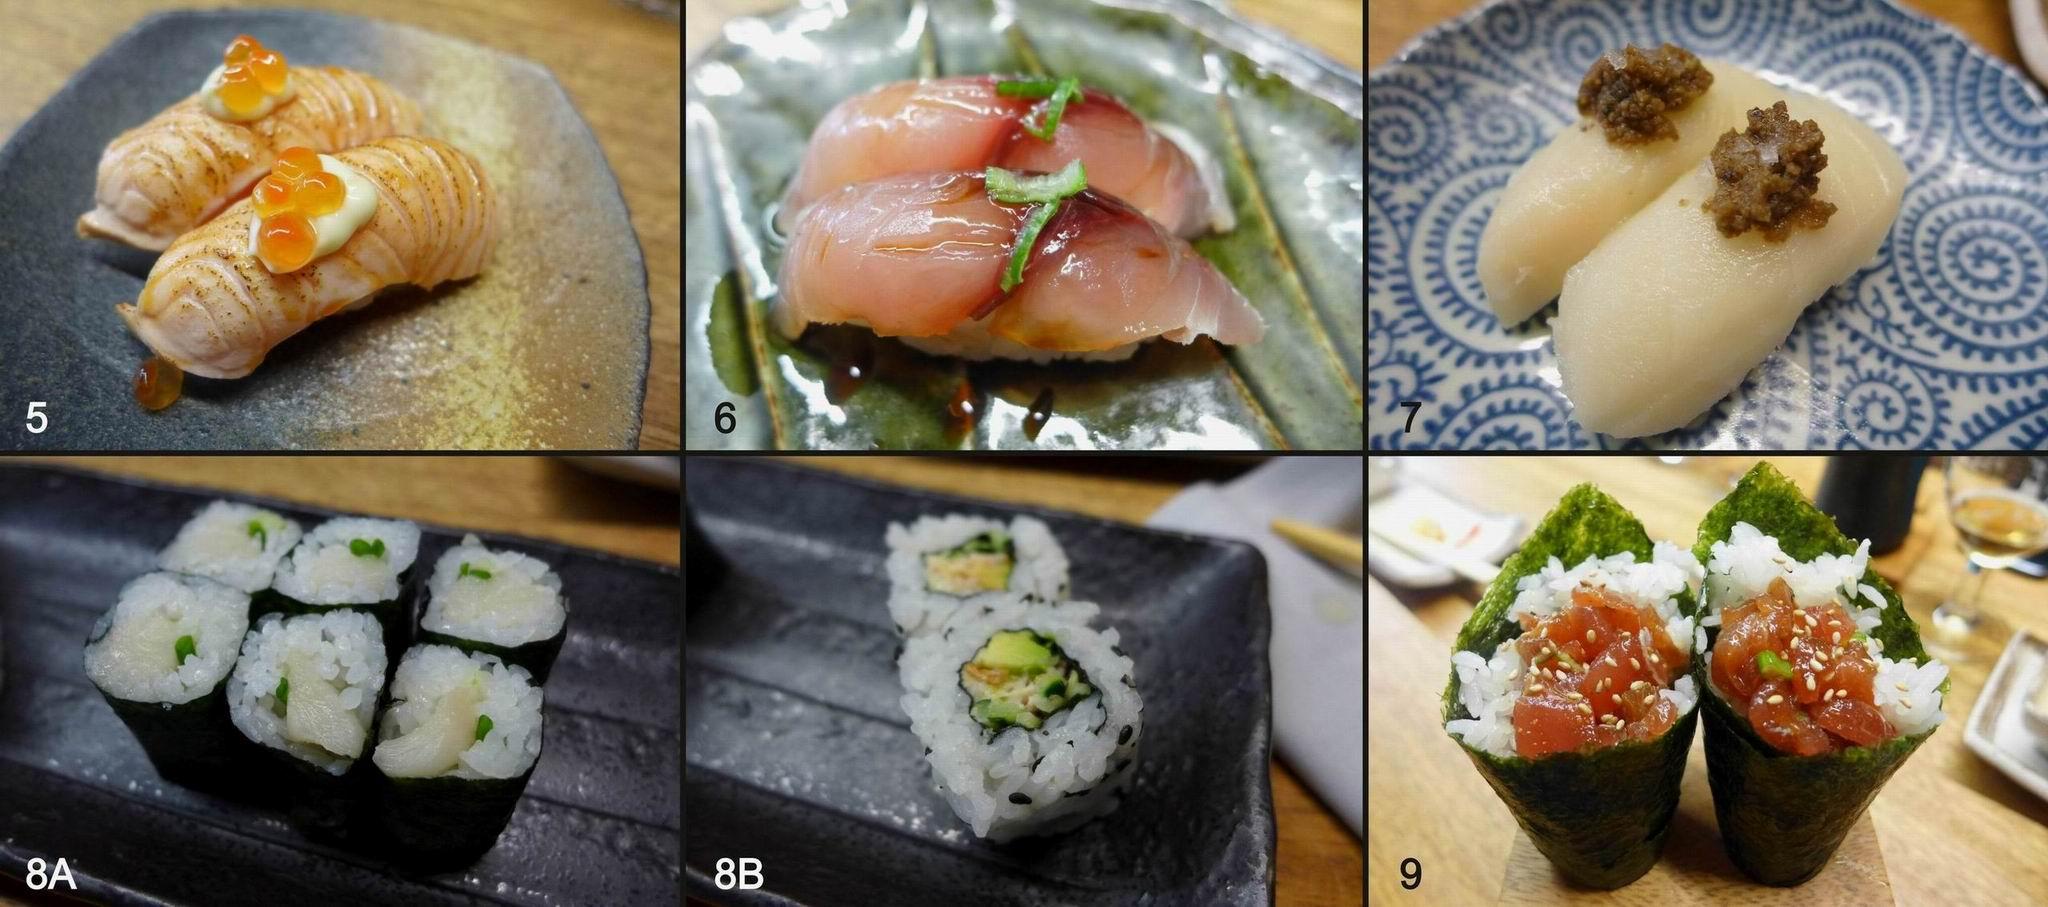 Restaurante Nozomi Sushi Bar Variedades de sushi